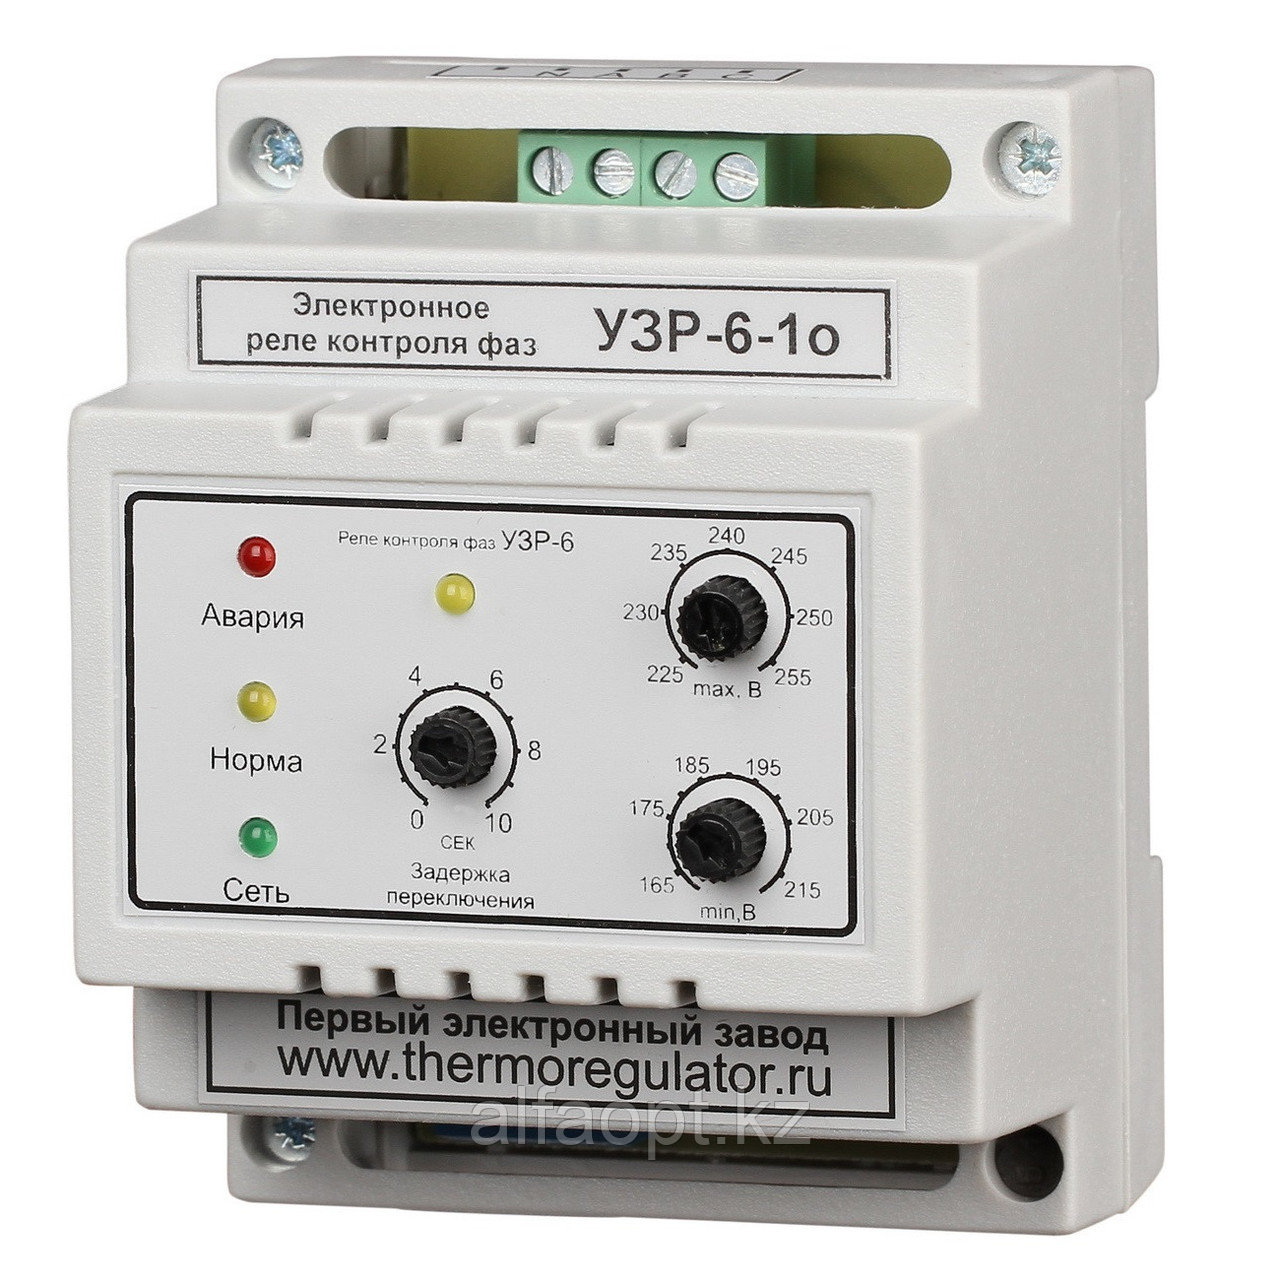 Реле контроля фаз УЗР-6